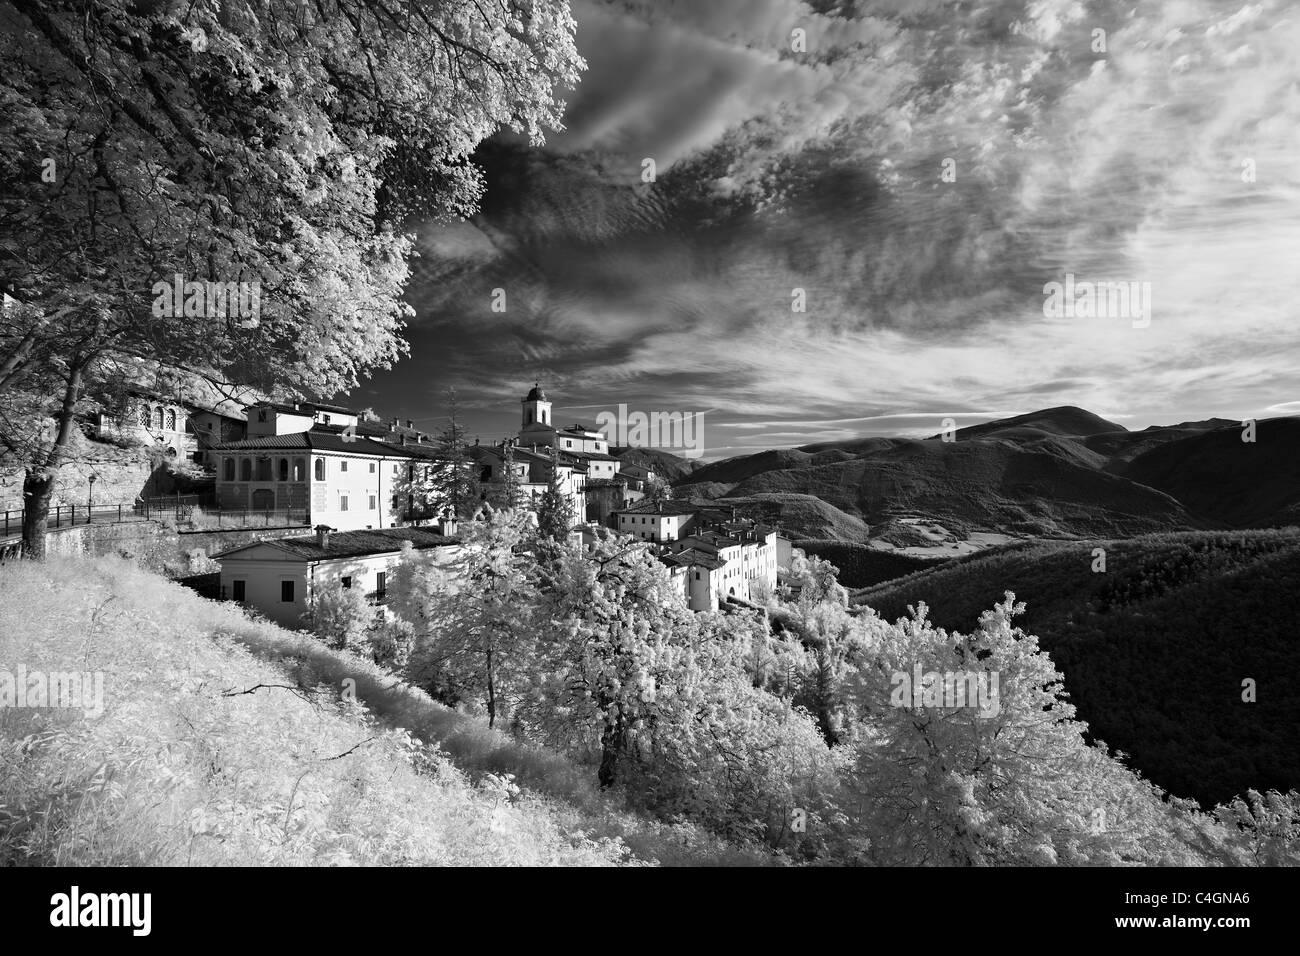 Abetto in the Valnerina, Monti Sibillini National Park, Umbria, Italy - Stock Image